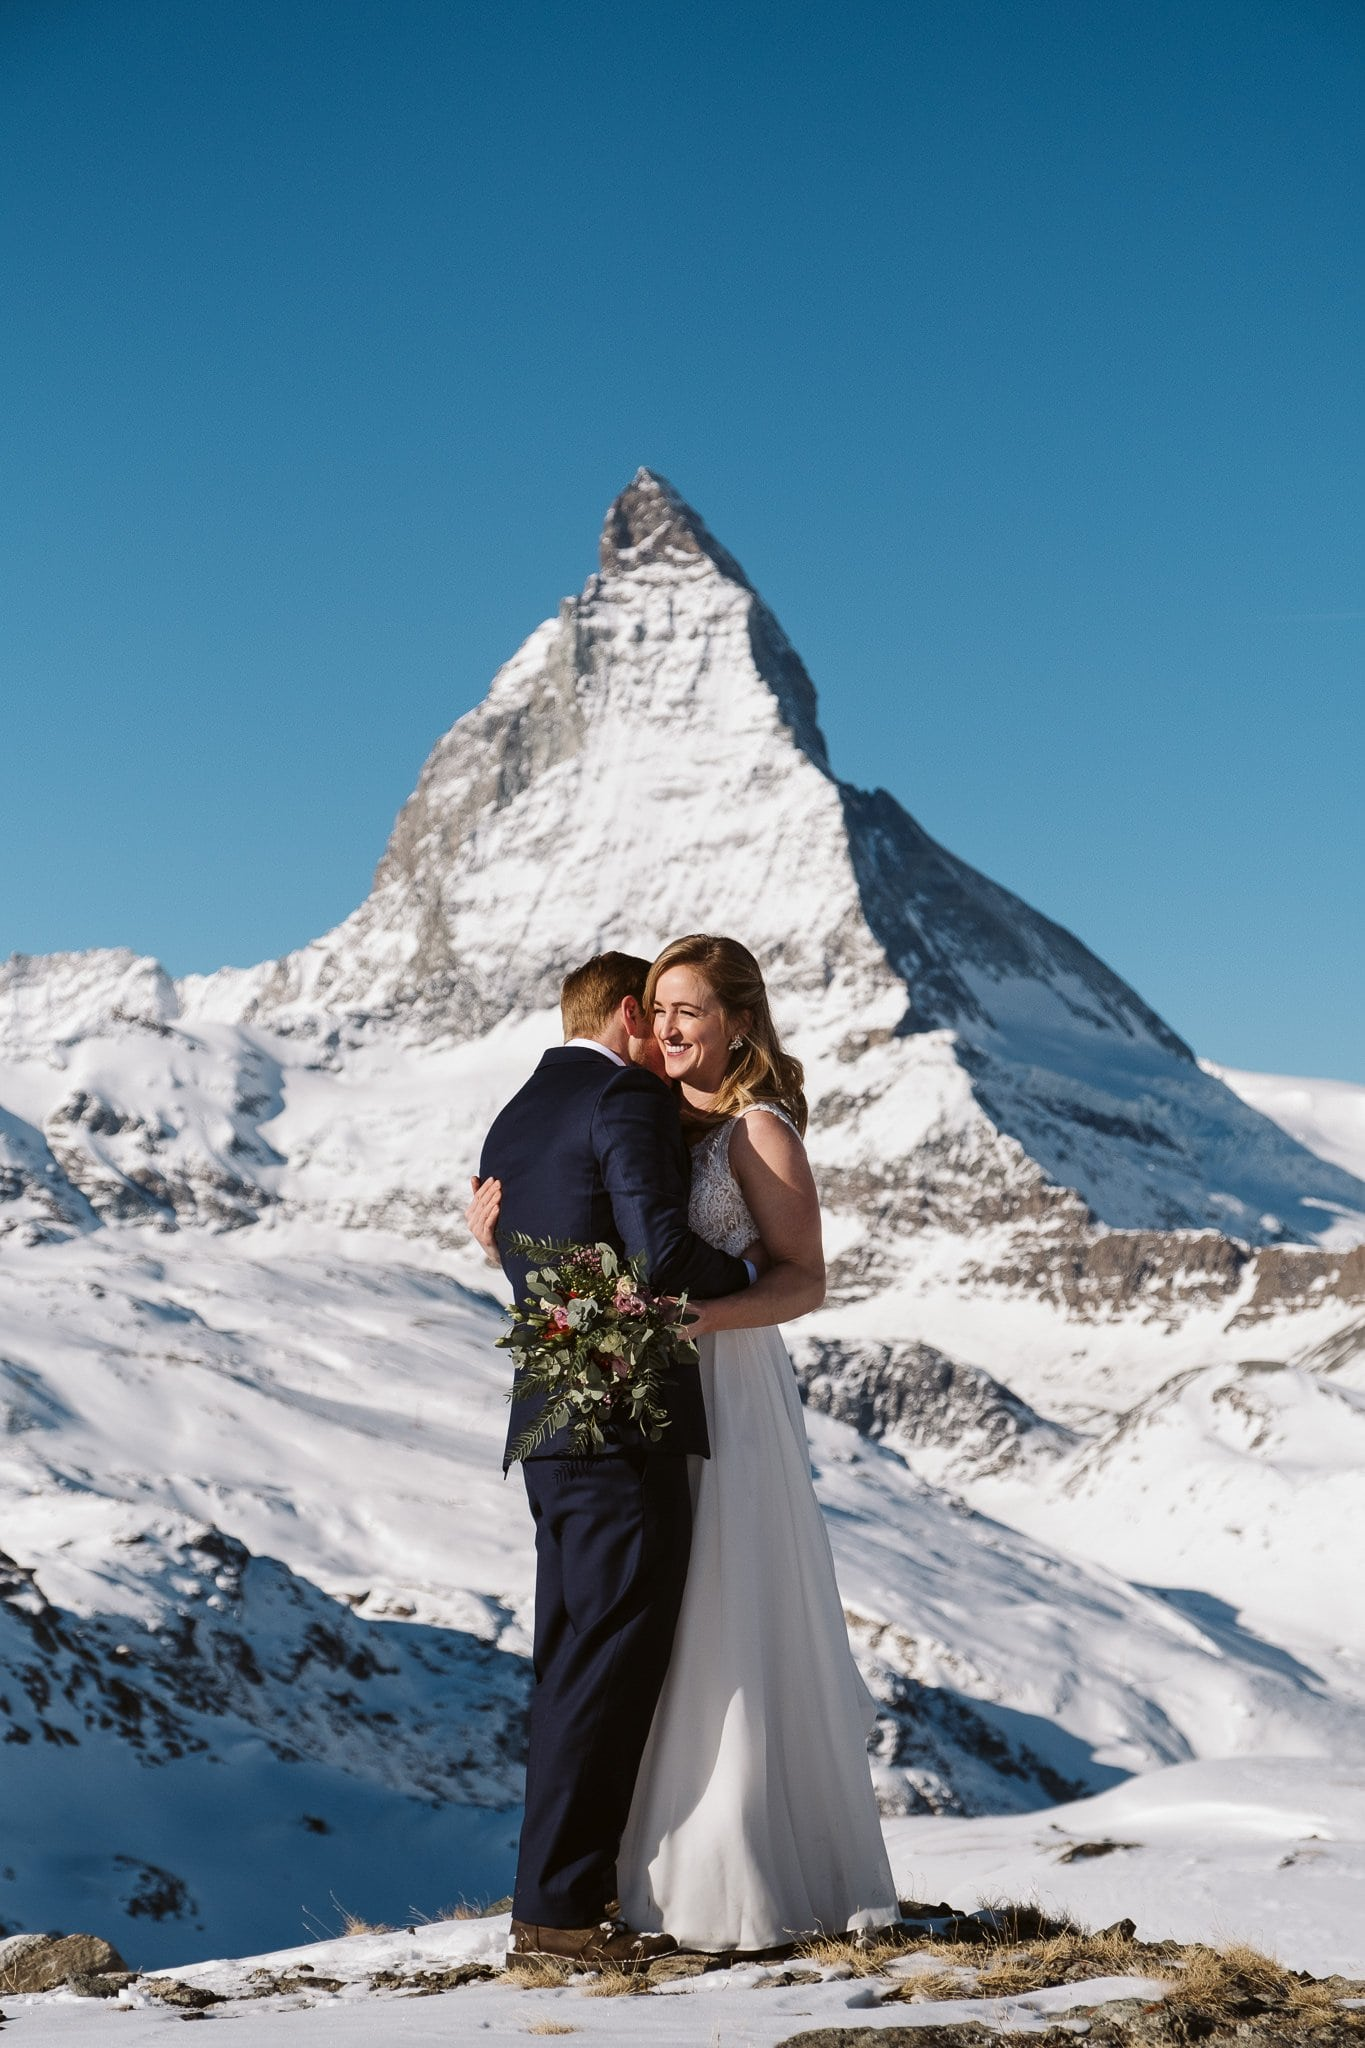 Switzerland elopement photographer at Matterhorn in Zermatt